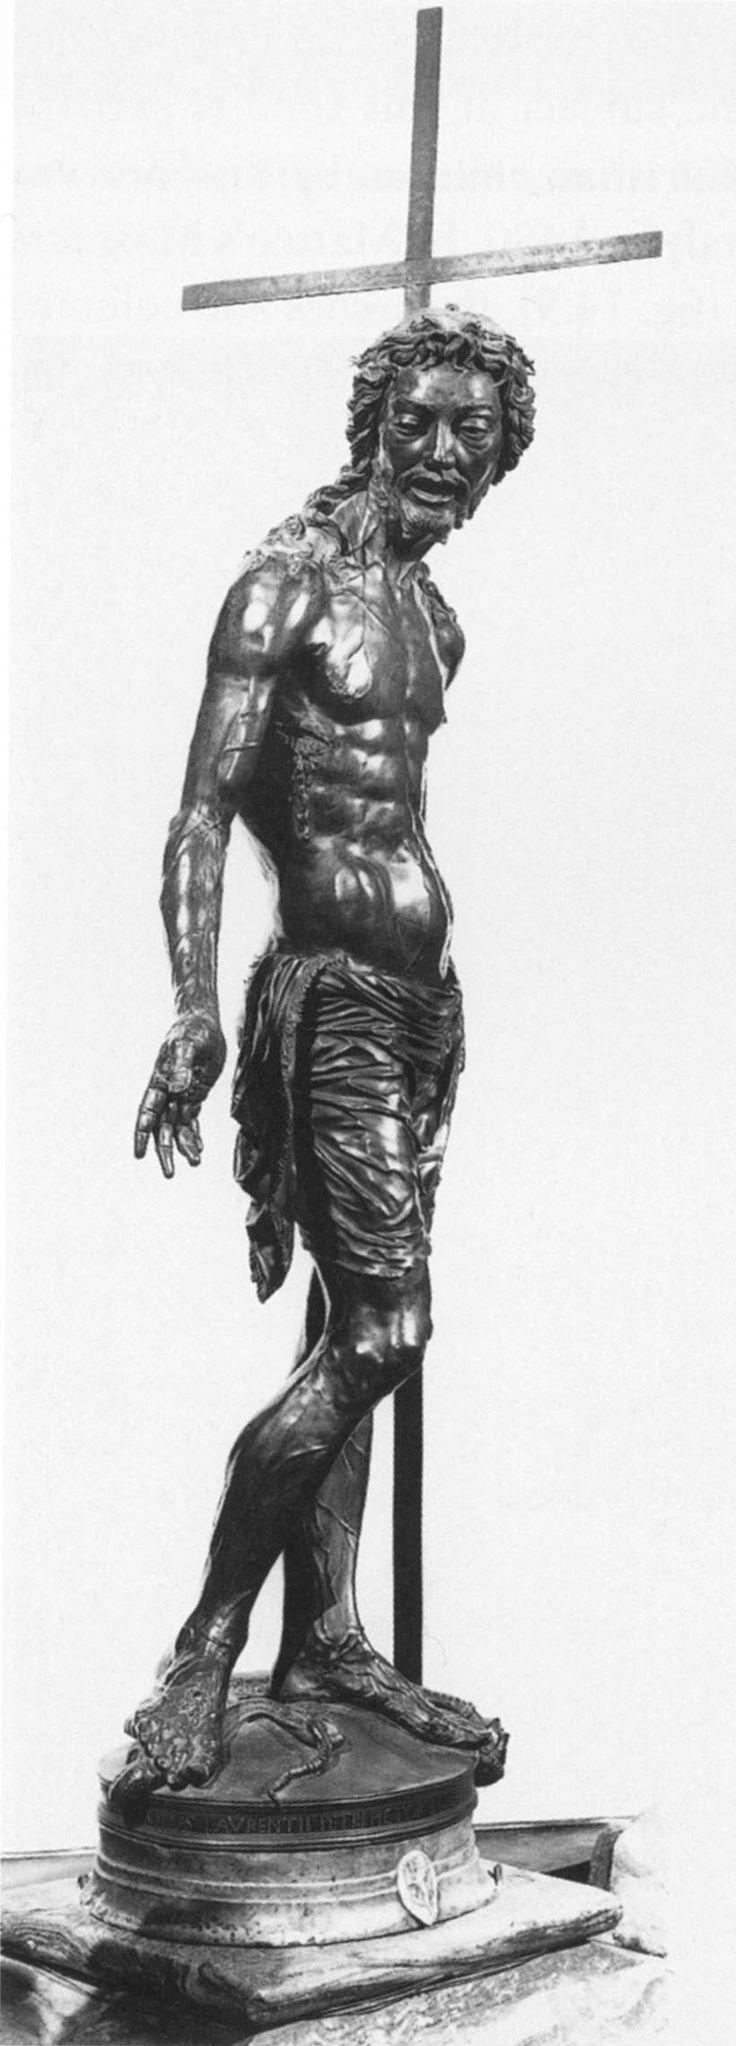 Веккьетта. Воскресший Христос. Risen Christ. 1476 г. Bronze. Chiesa dell'Ospedale della Scala, Siena.